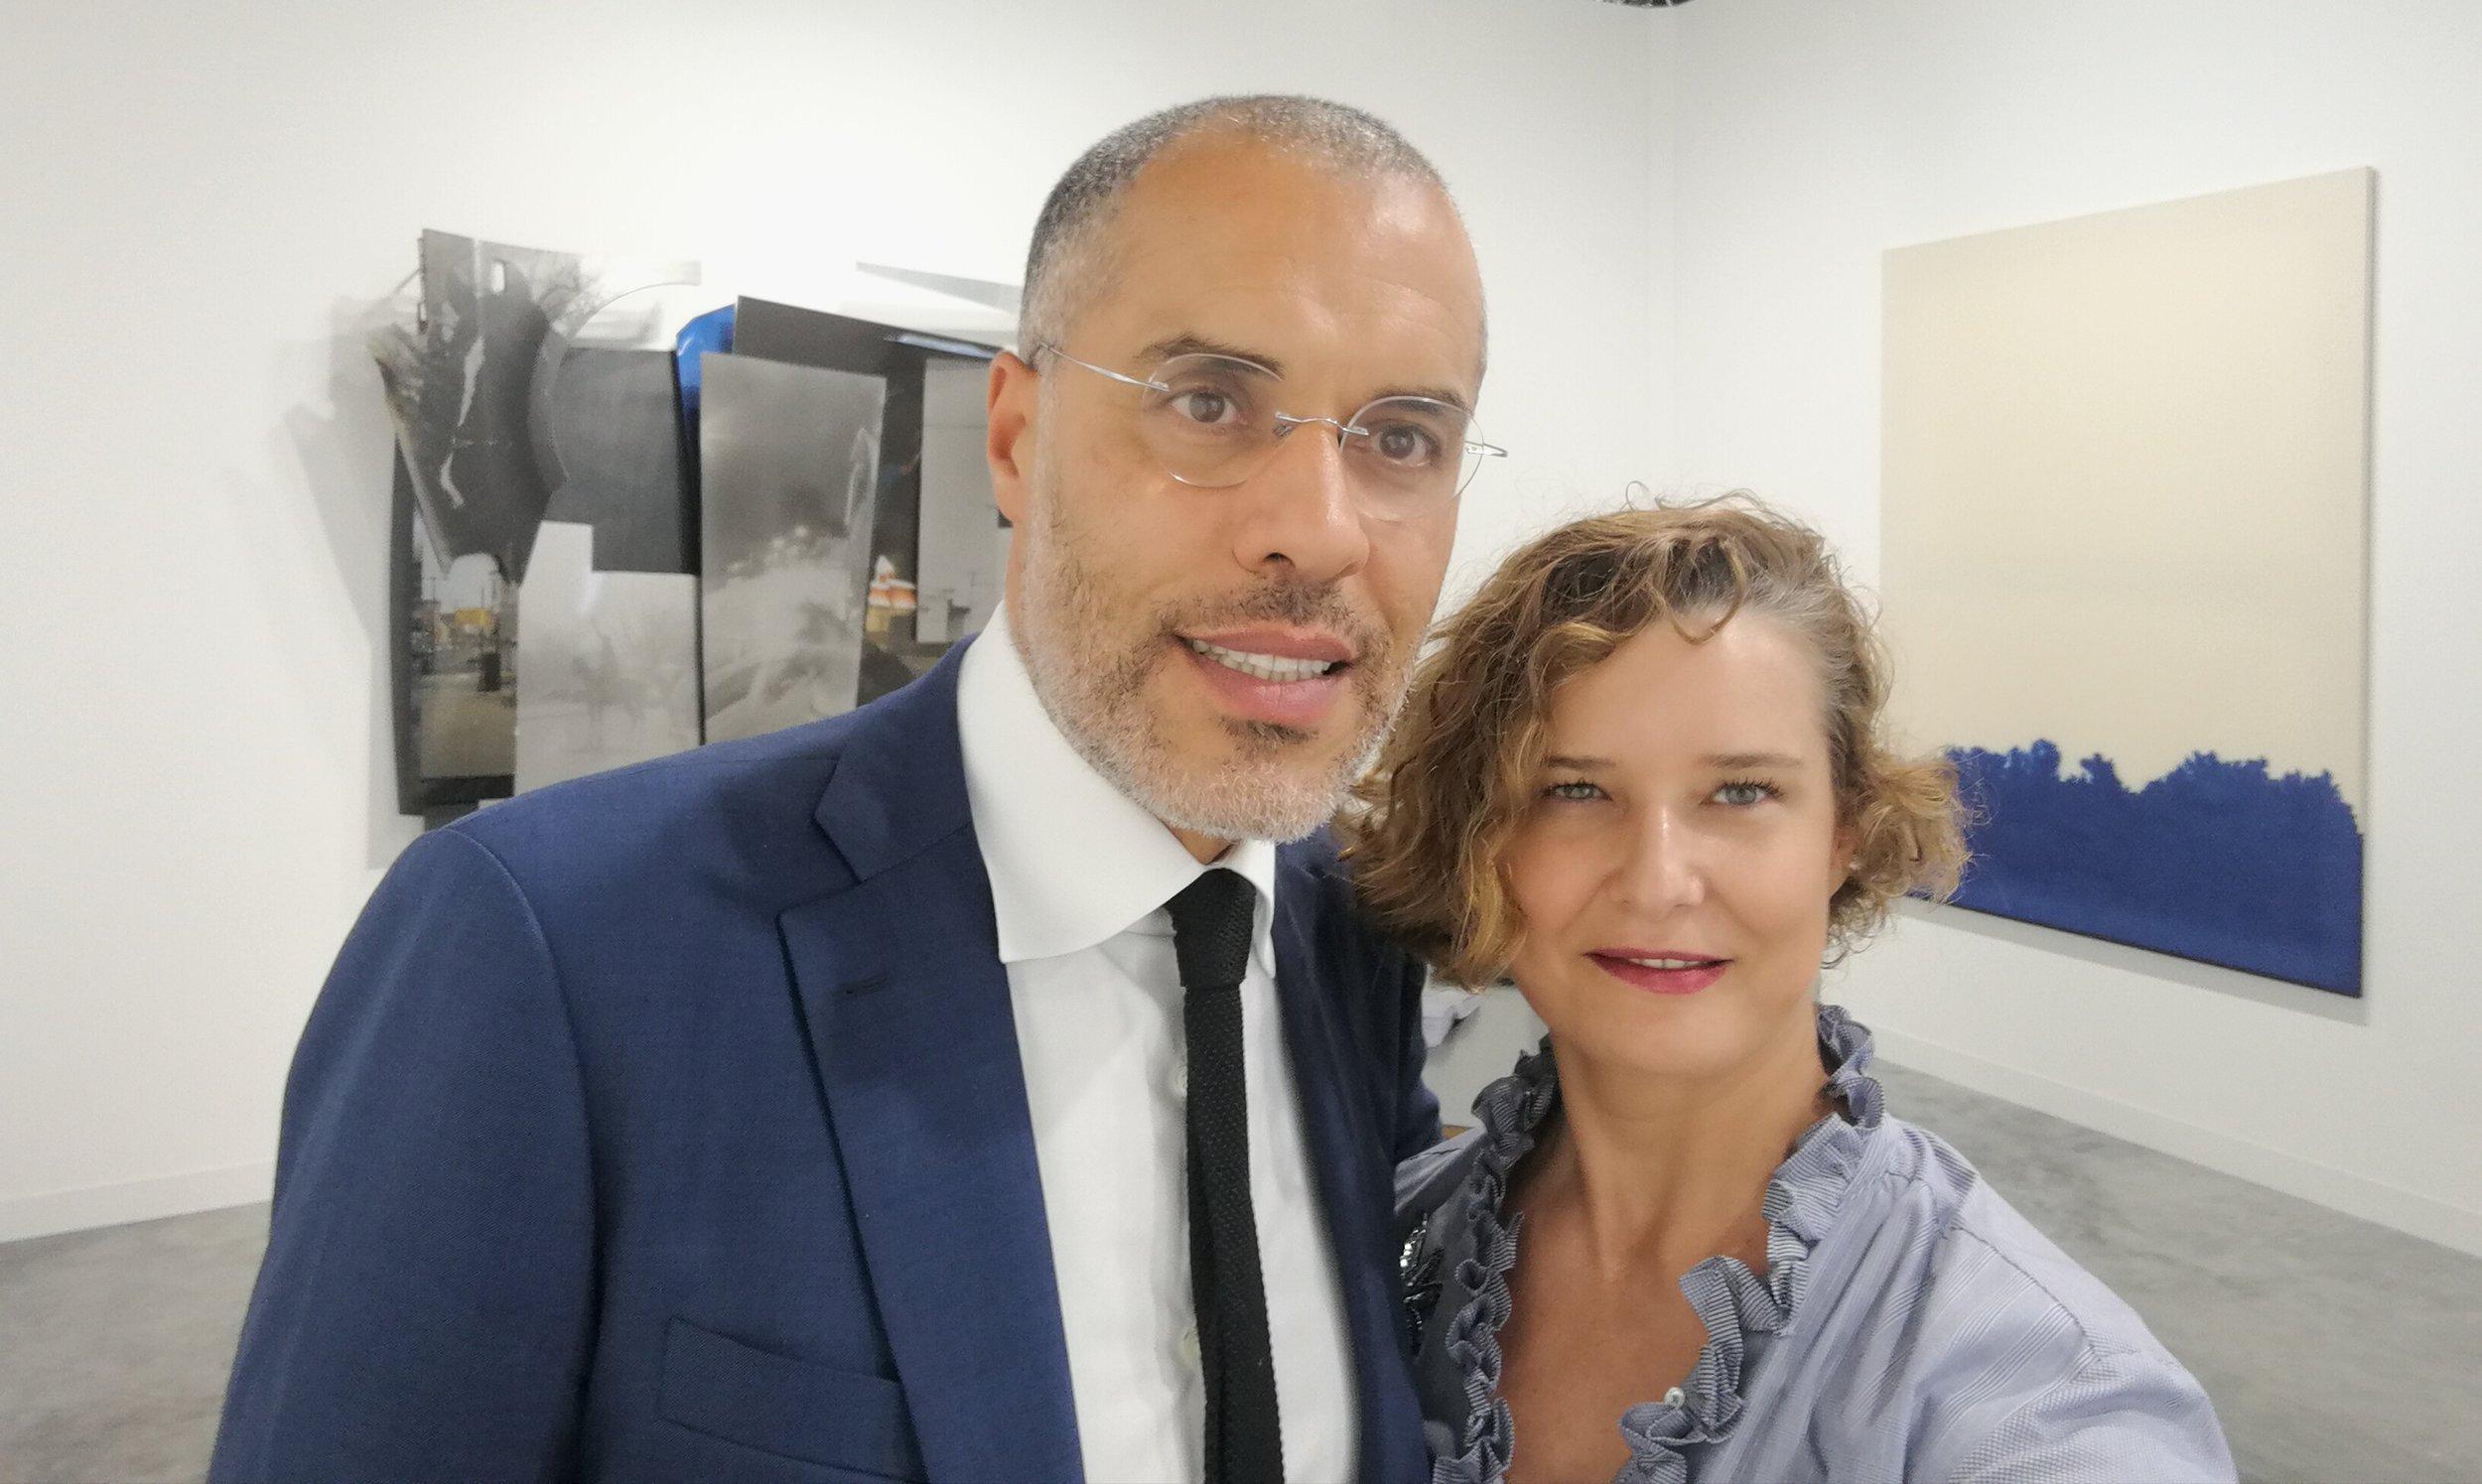 With Kamel Mennour, founder of Paris based Kamel Mennour gallery, at Art Basel Miami